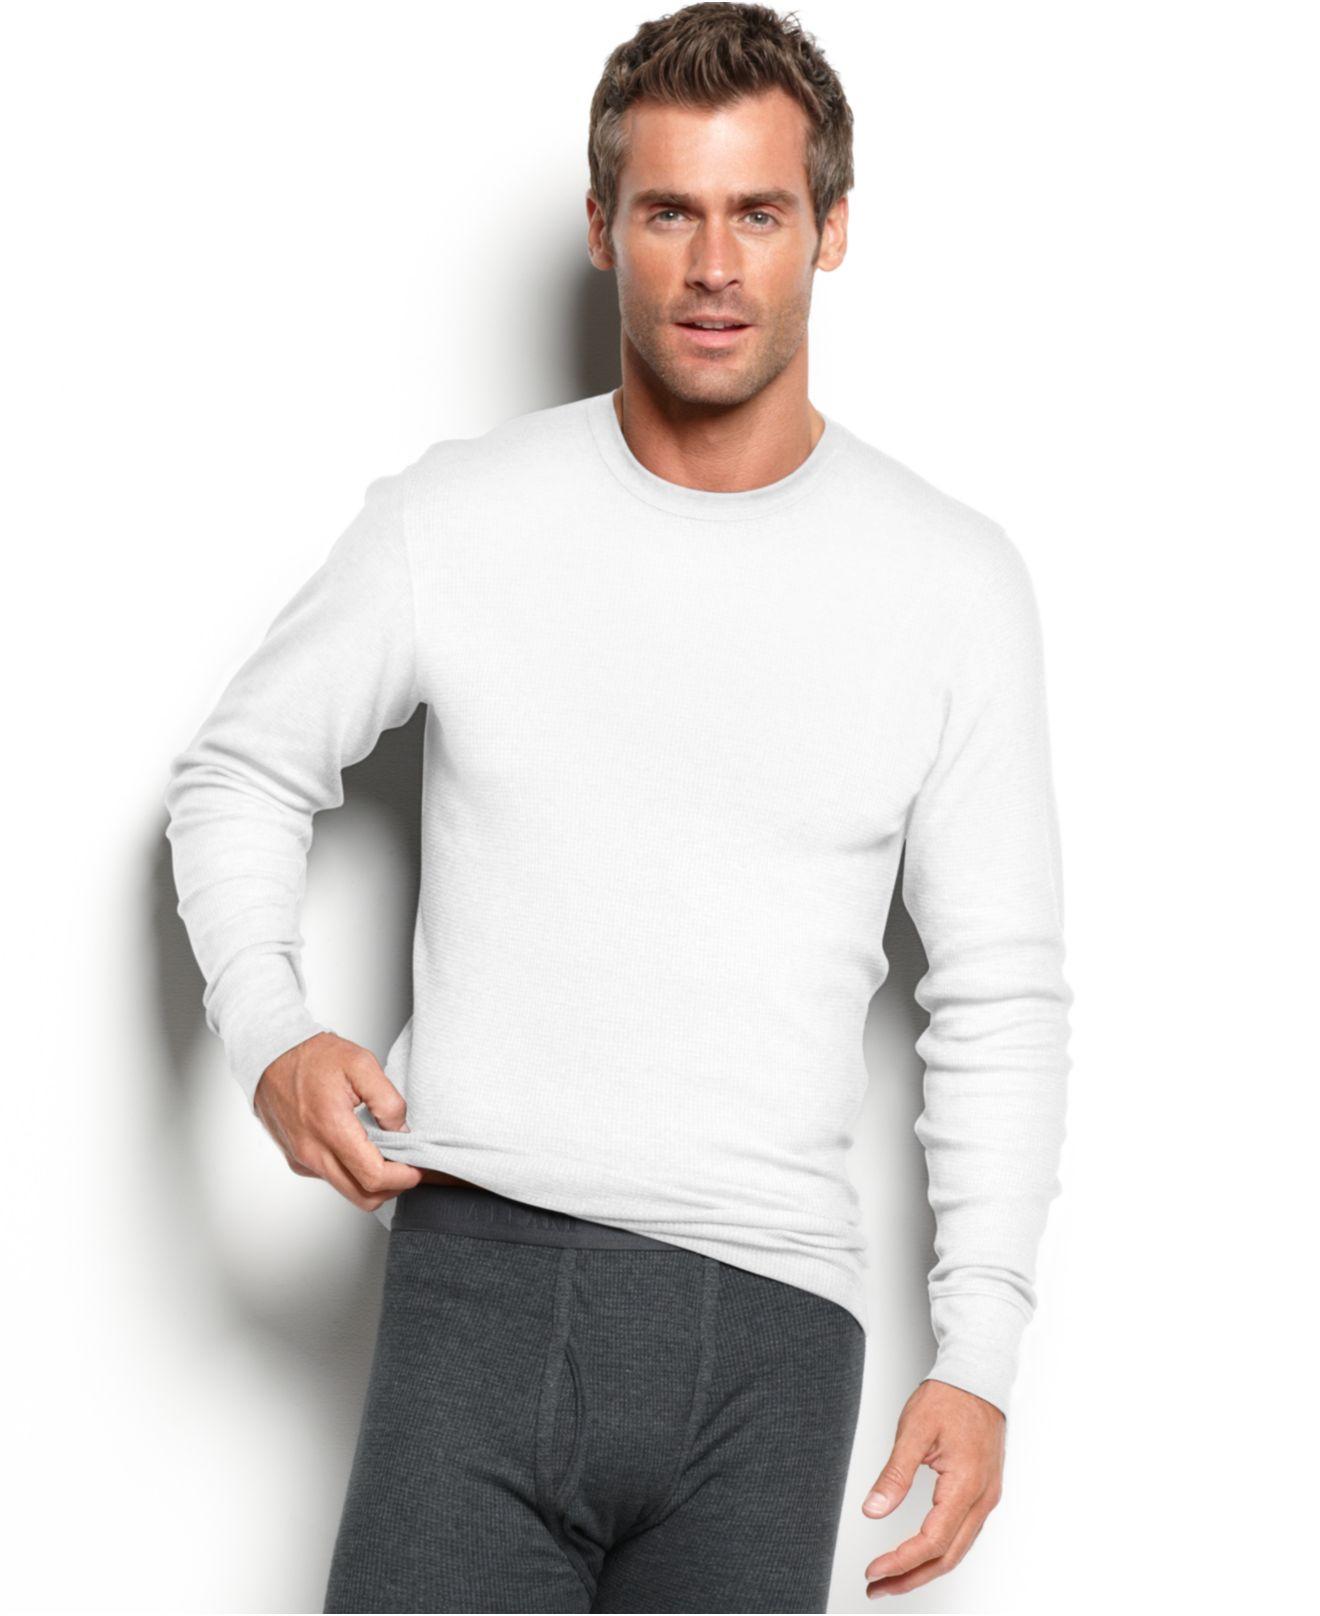 40adfdc0224 Alfani Stretch V Neck T Shirt - BCD Tofu House